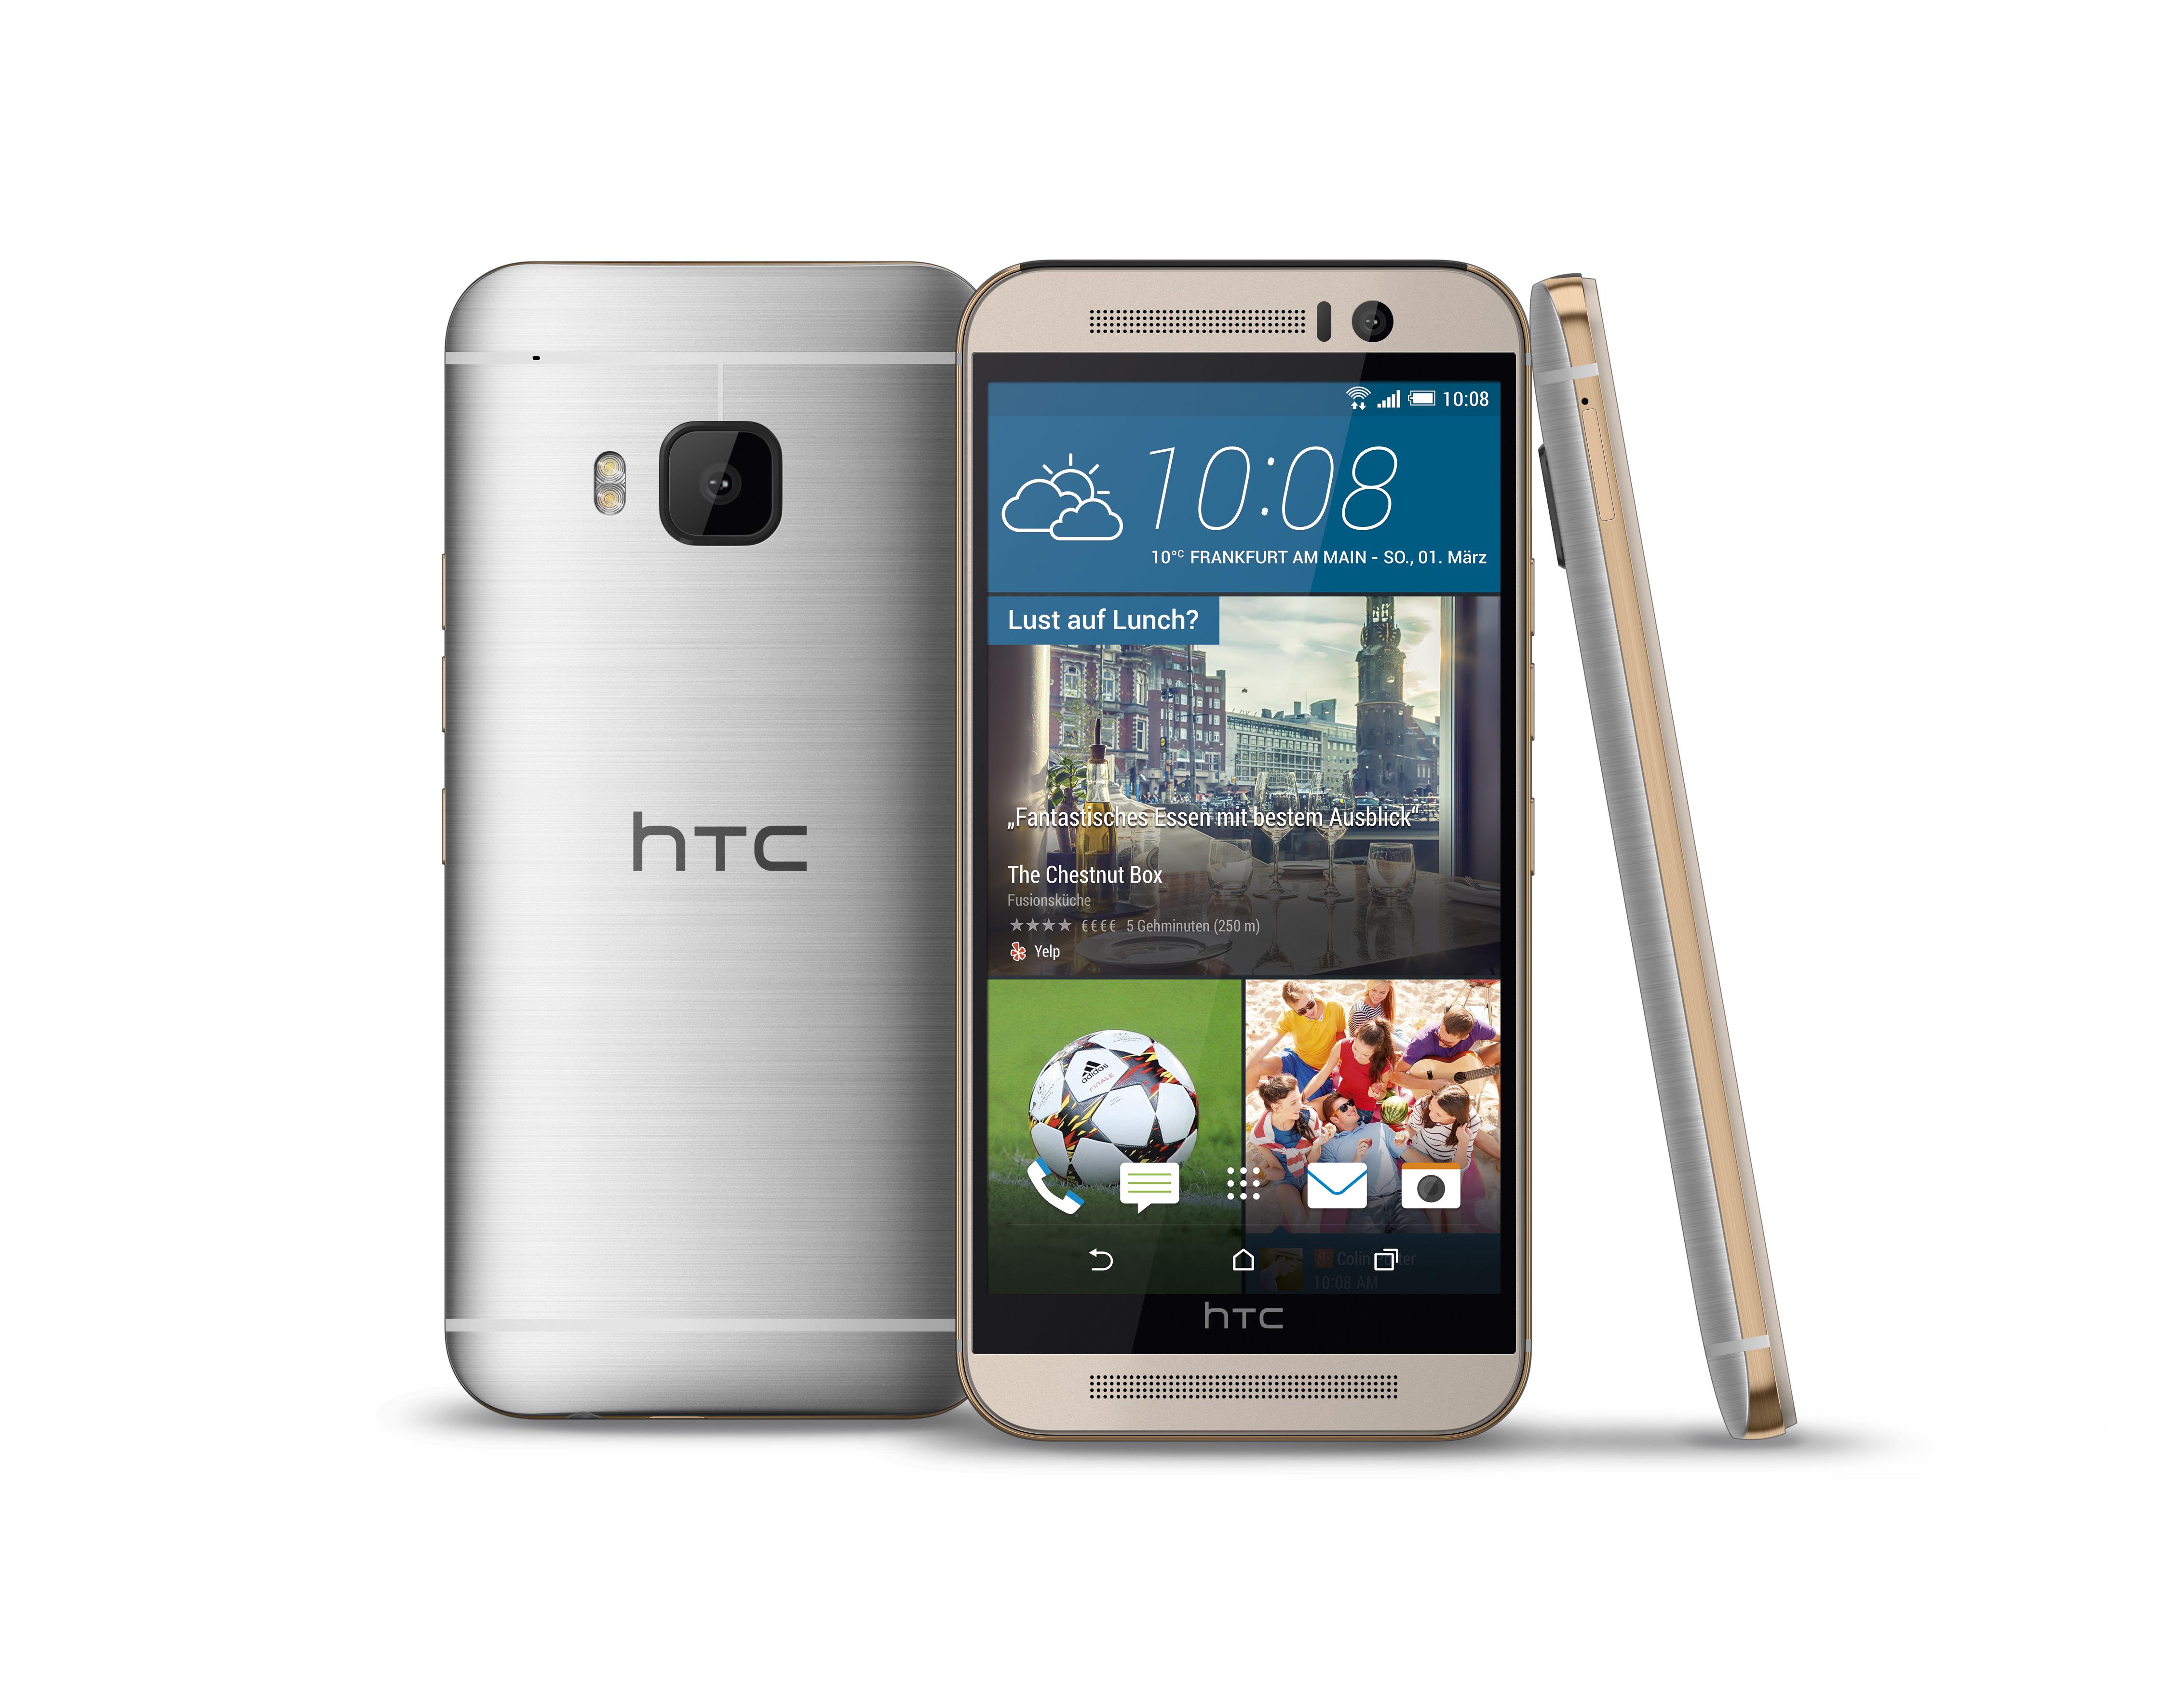 HTC-One-M9-HTC.jpg